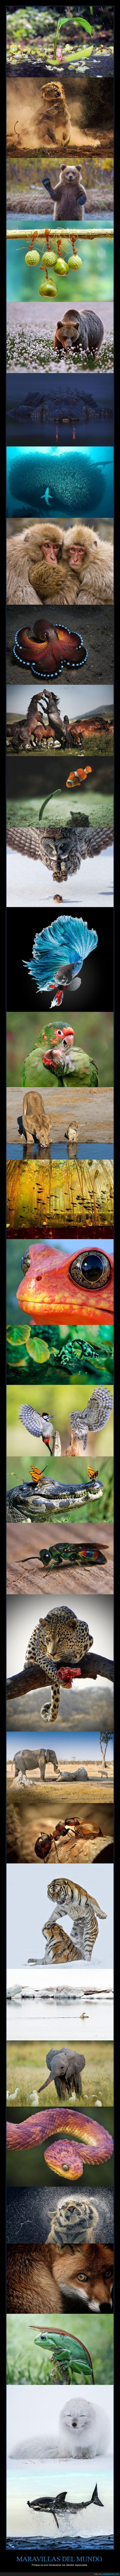 animales,bestias,criaturas,increíble,maravillas,Mundo,naturaleza,paisajes,Planeta,Tierra